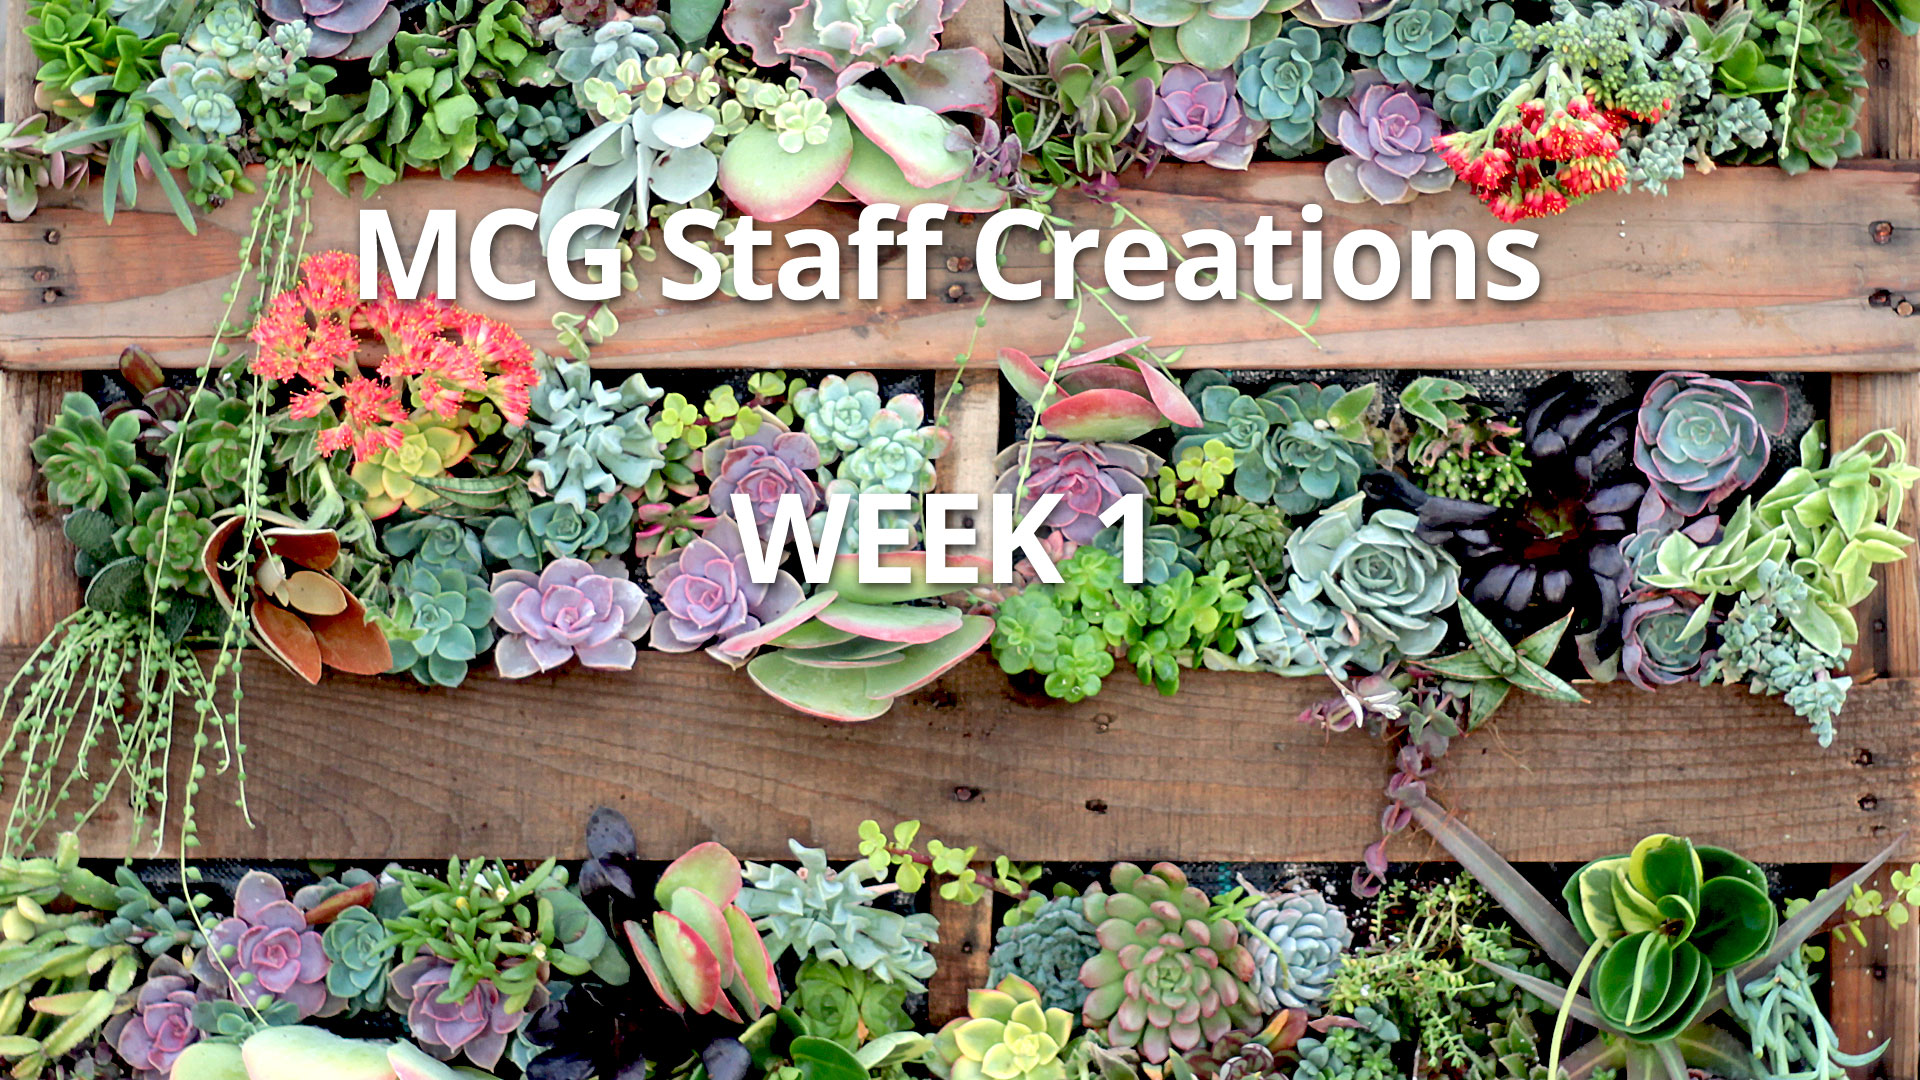 Diy Succulent Living Wall Using Wood Pallet Employee Creations Week 1 Mountain Crest Gardens